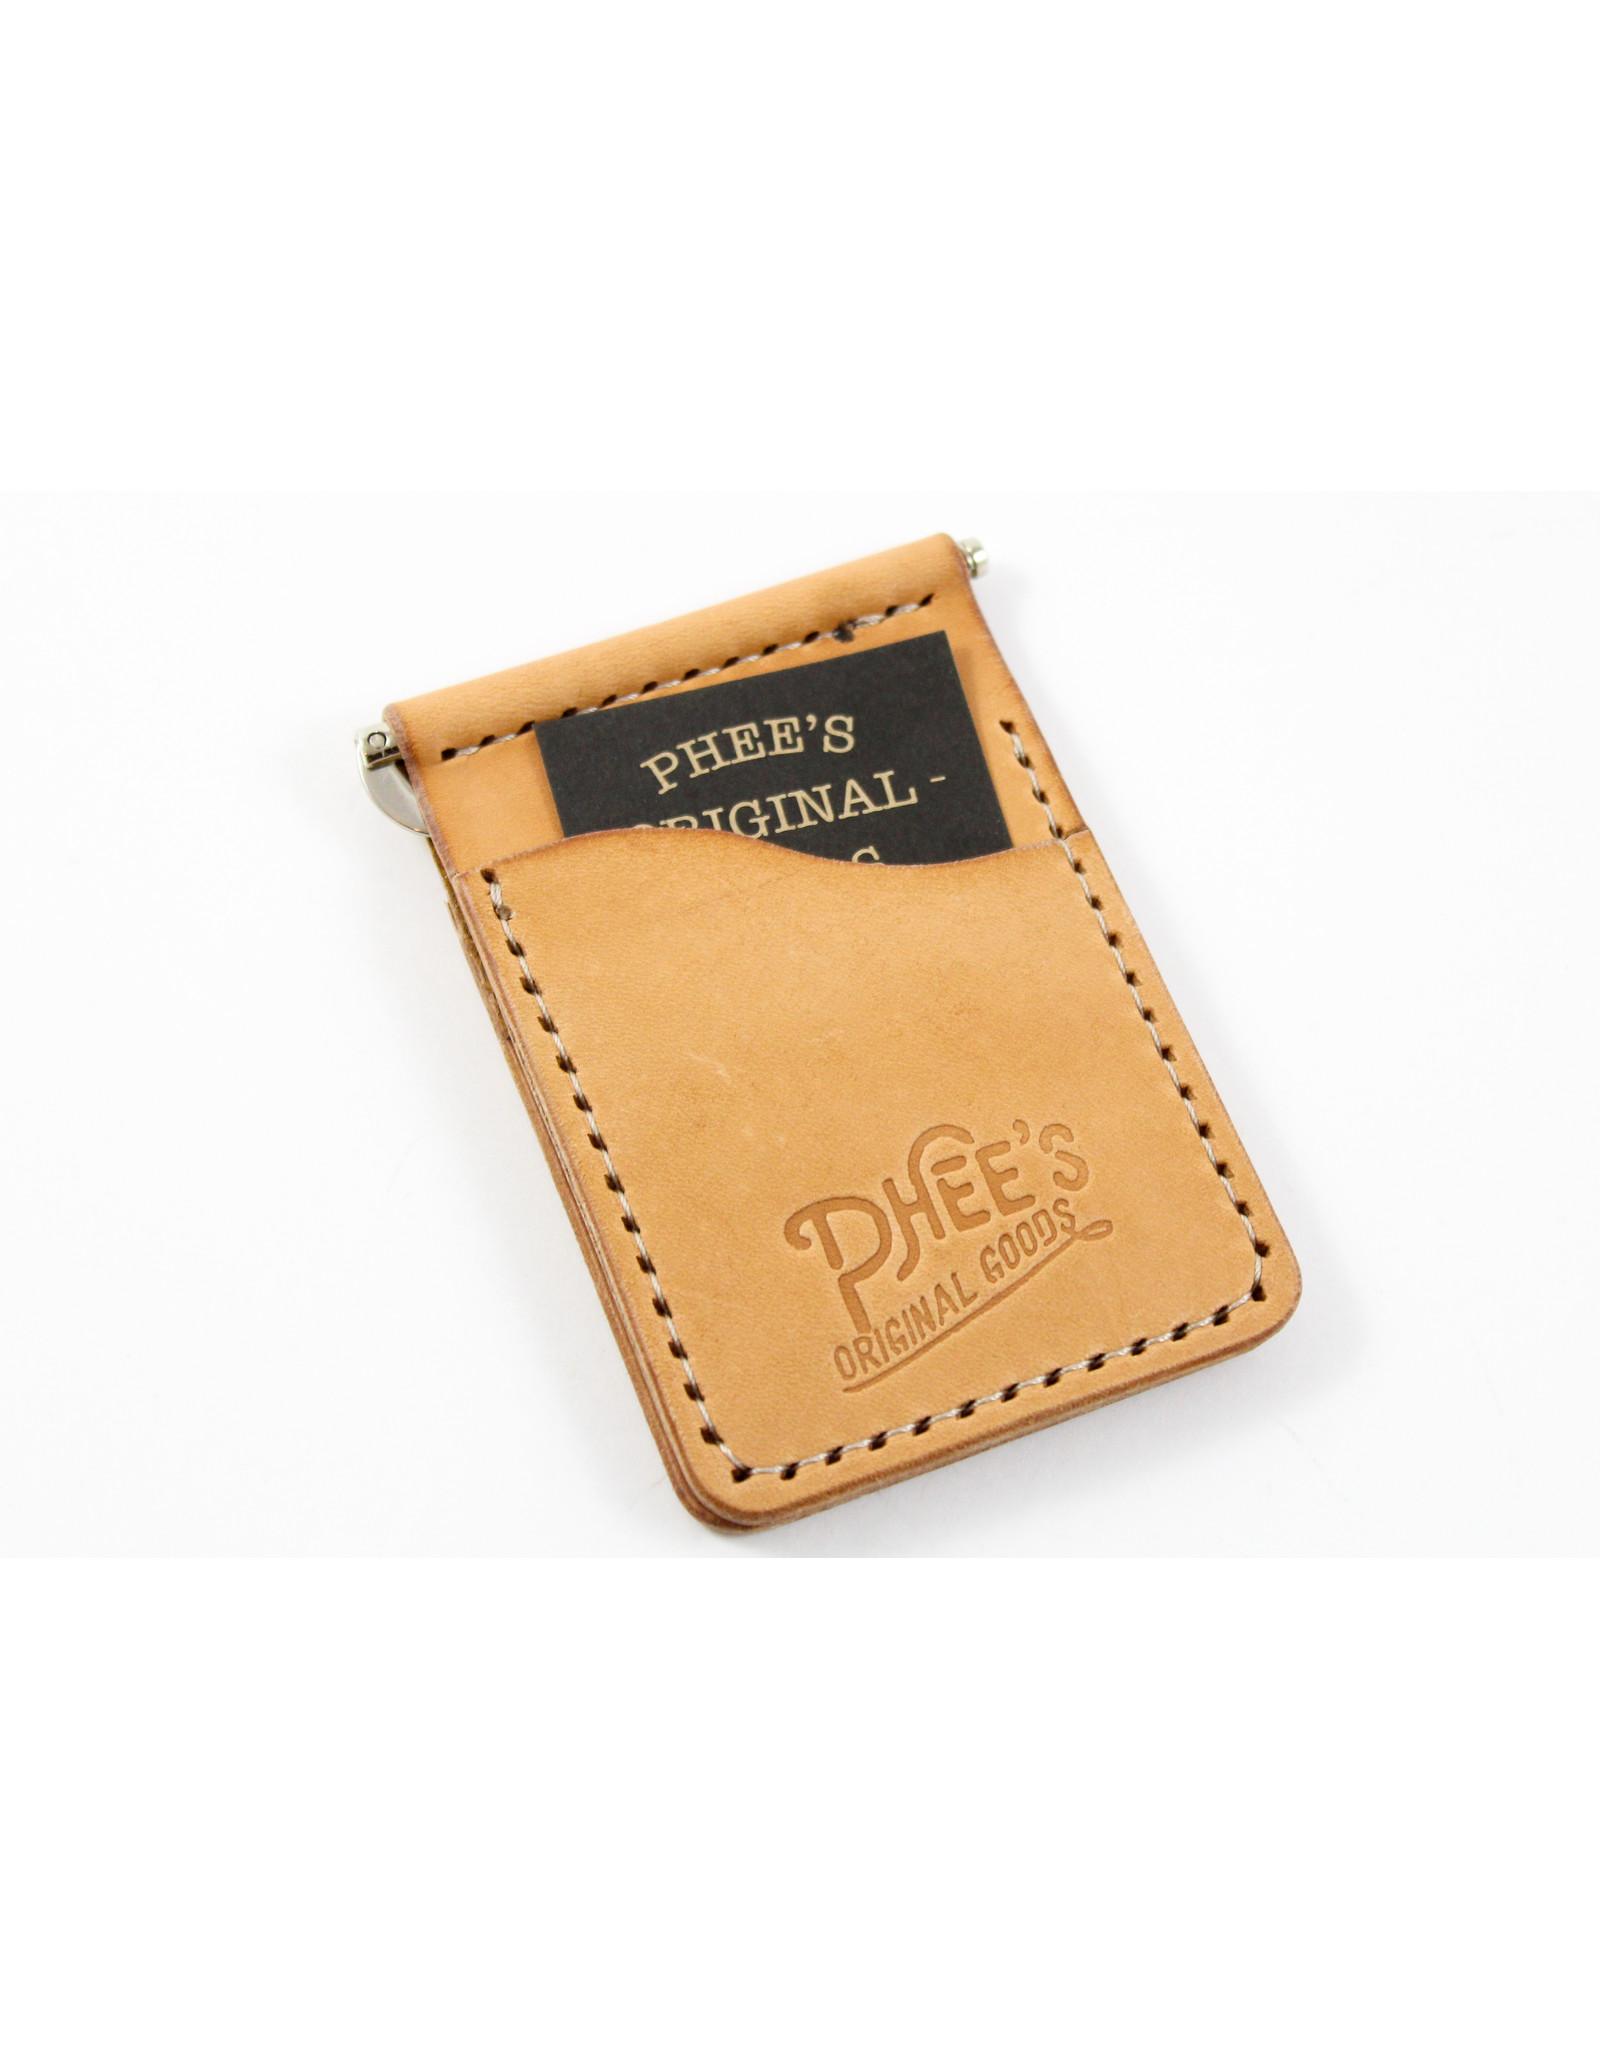 Kyle McPhee Dunvegan Money Clip Wallet by Phee's Original Goods